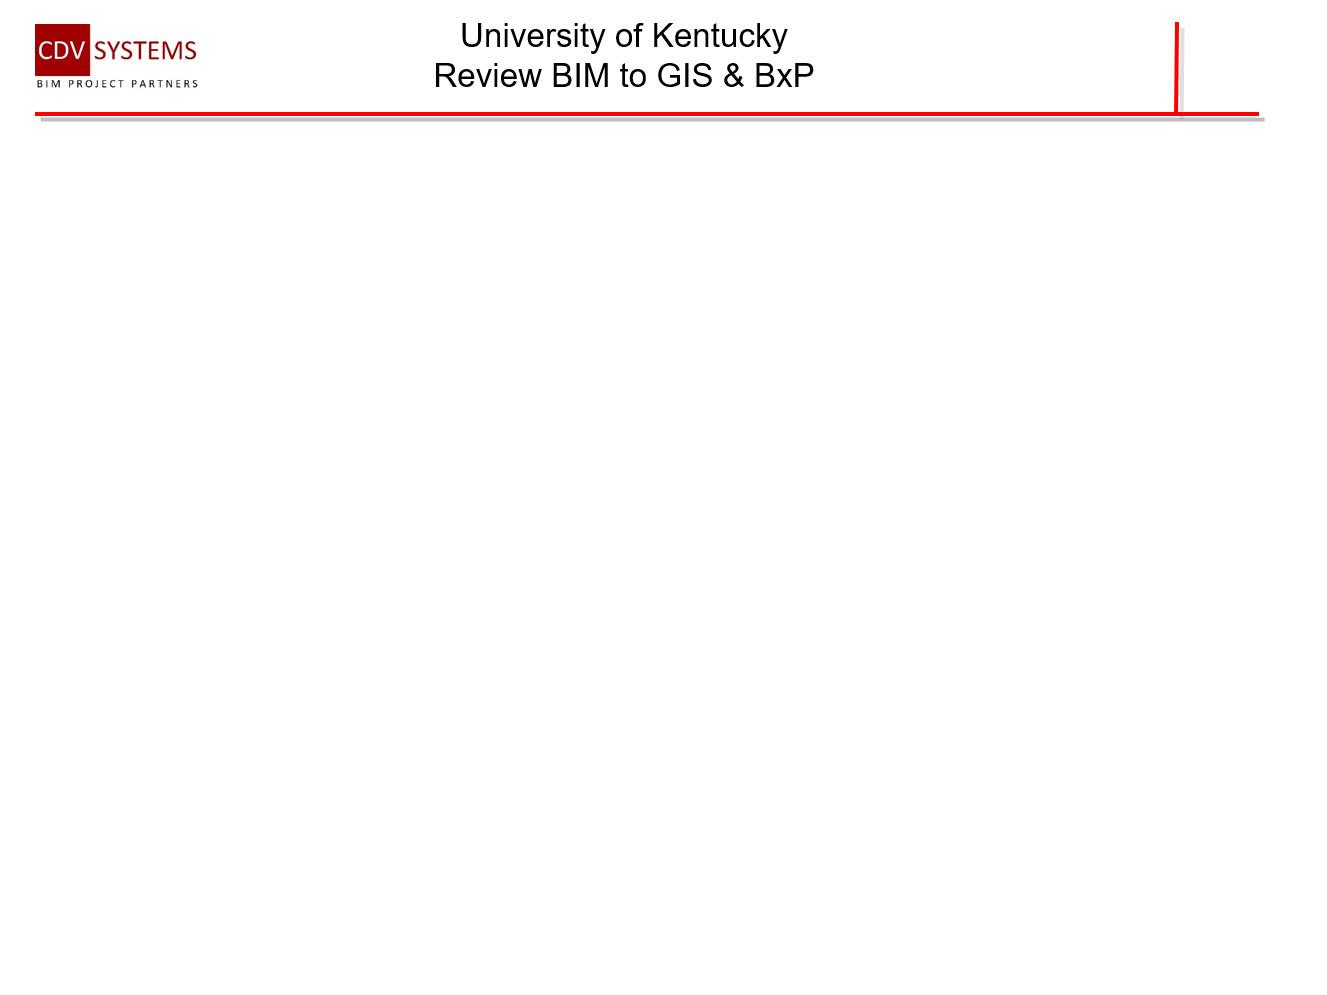 University of Kentucky_001w.jpg